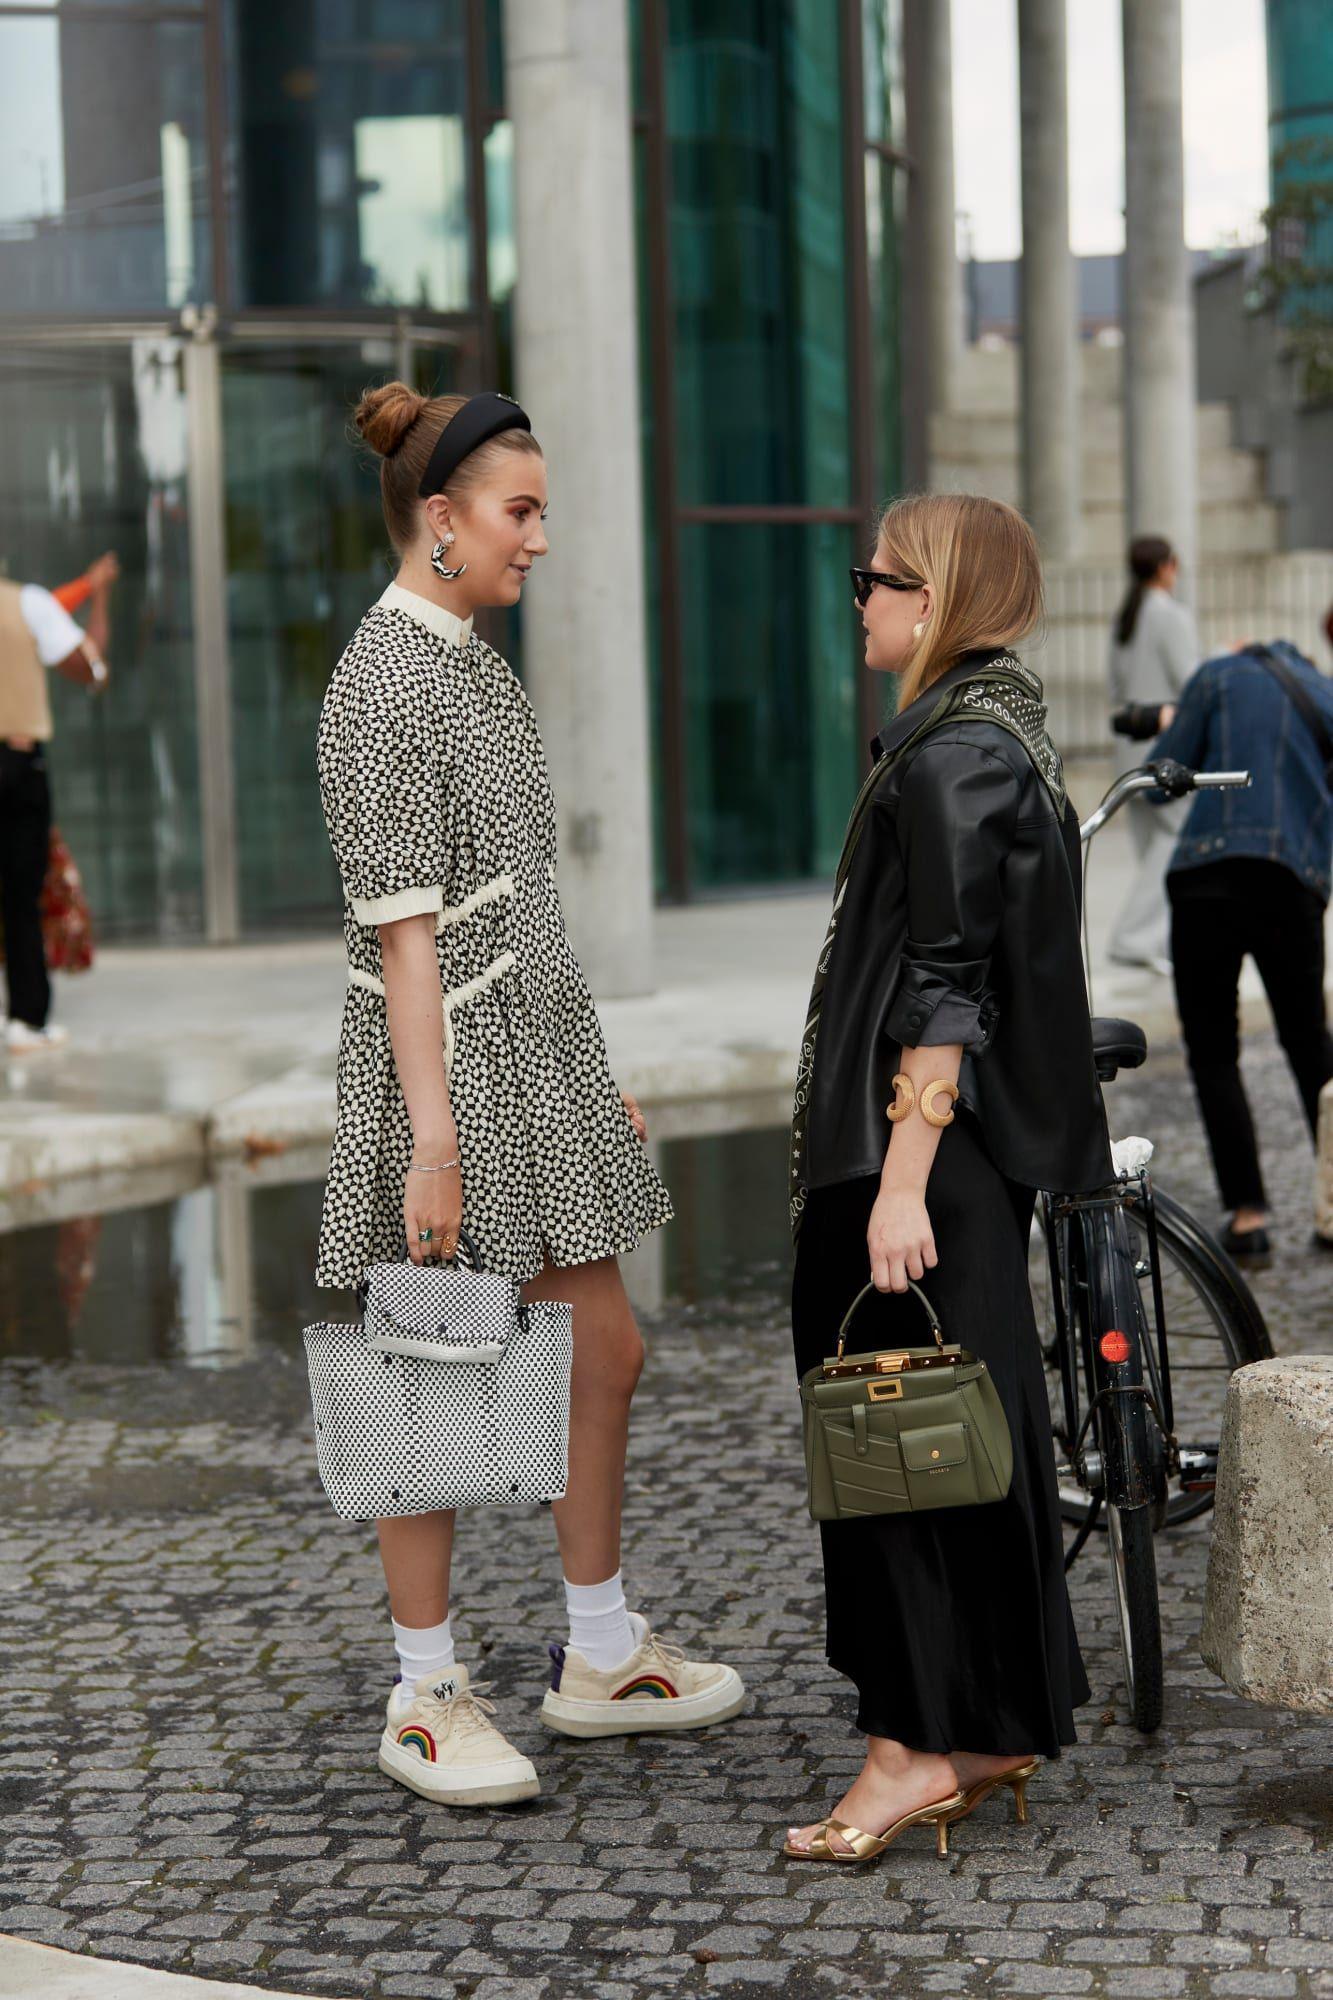 Blazers Were a Street Style Favorite at Copenhagen Fashion Week